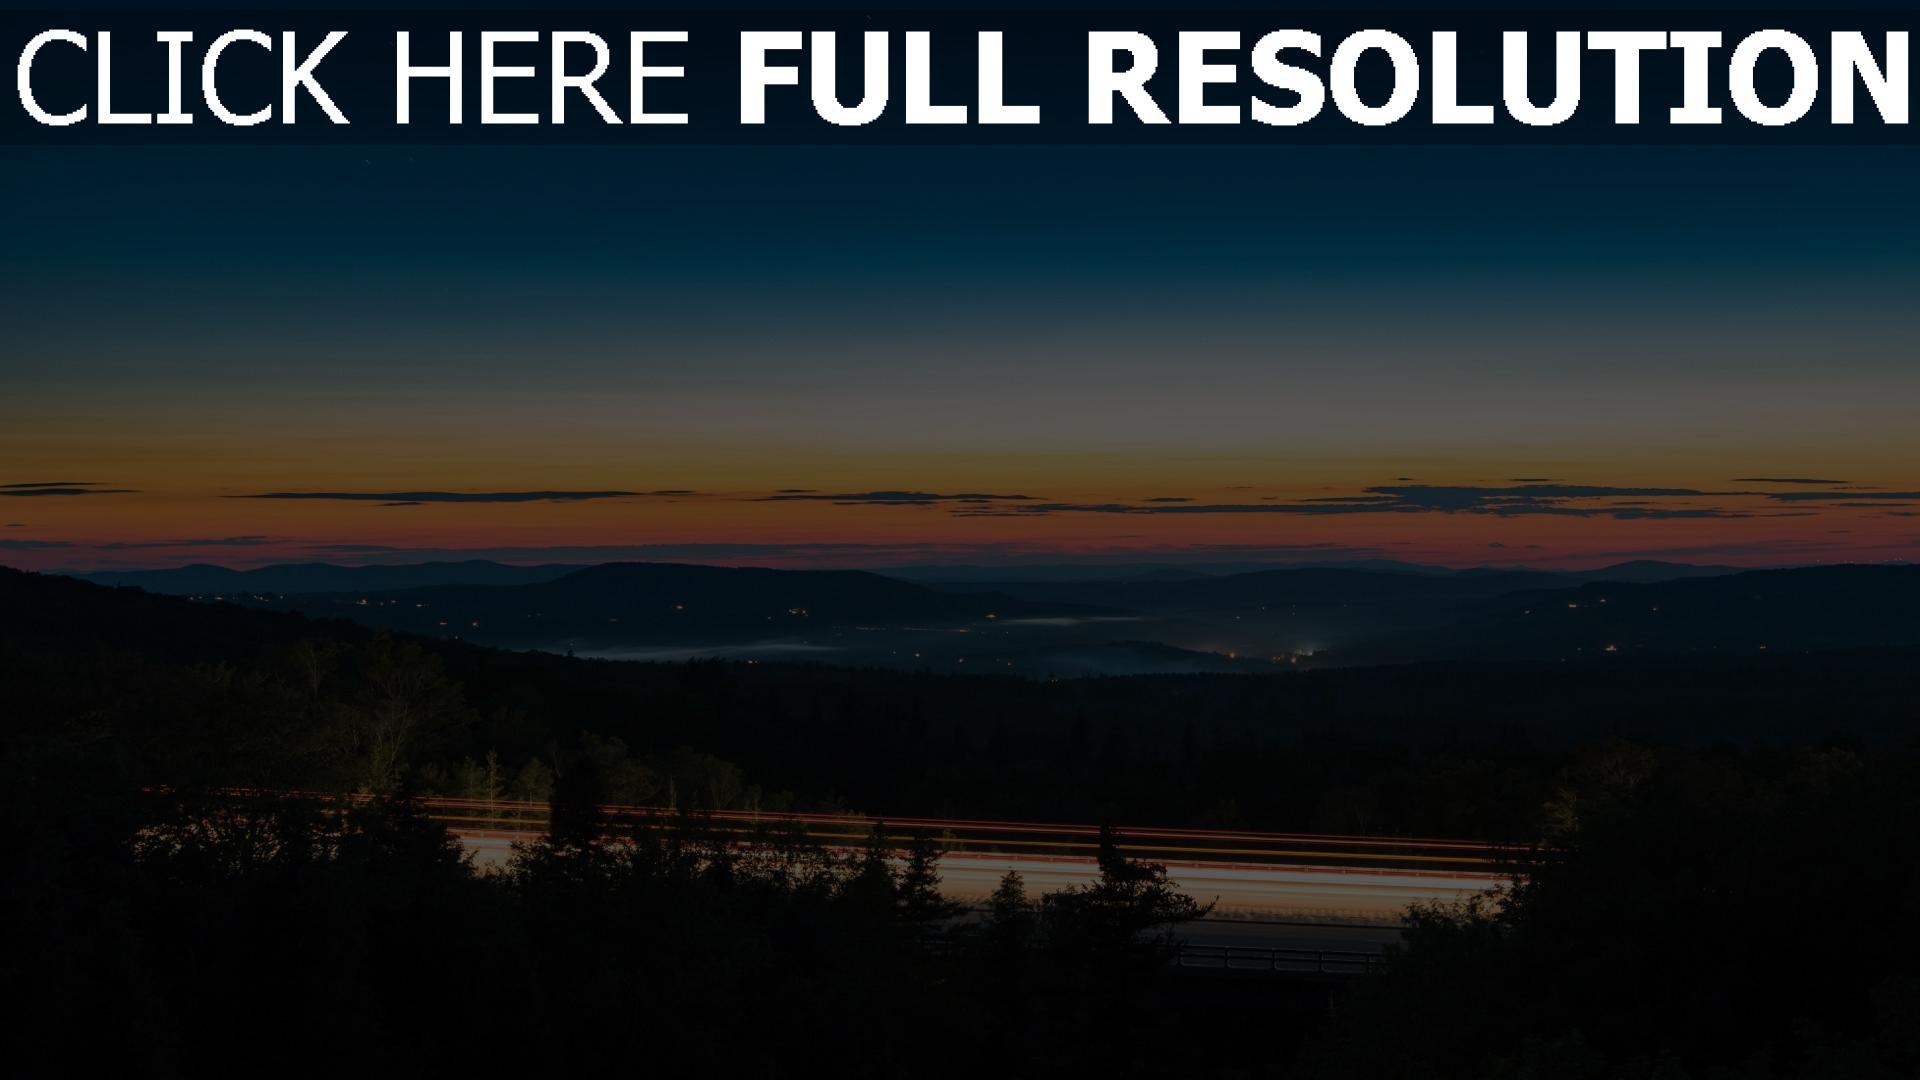 hd hintergrundbilder himmel sonnenuntergang nacht 1920x1080